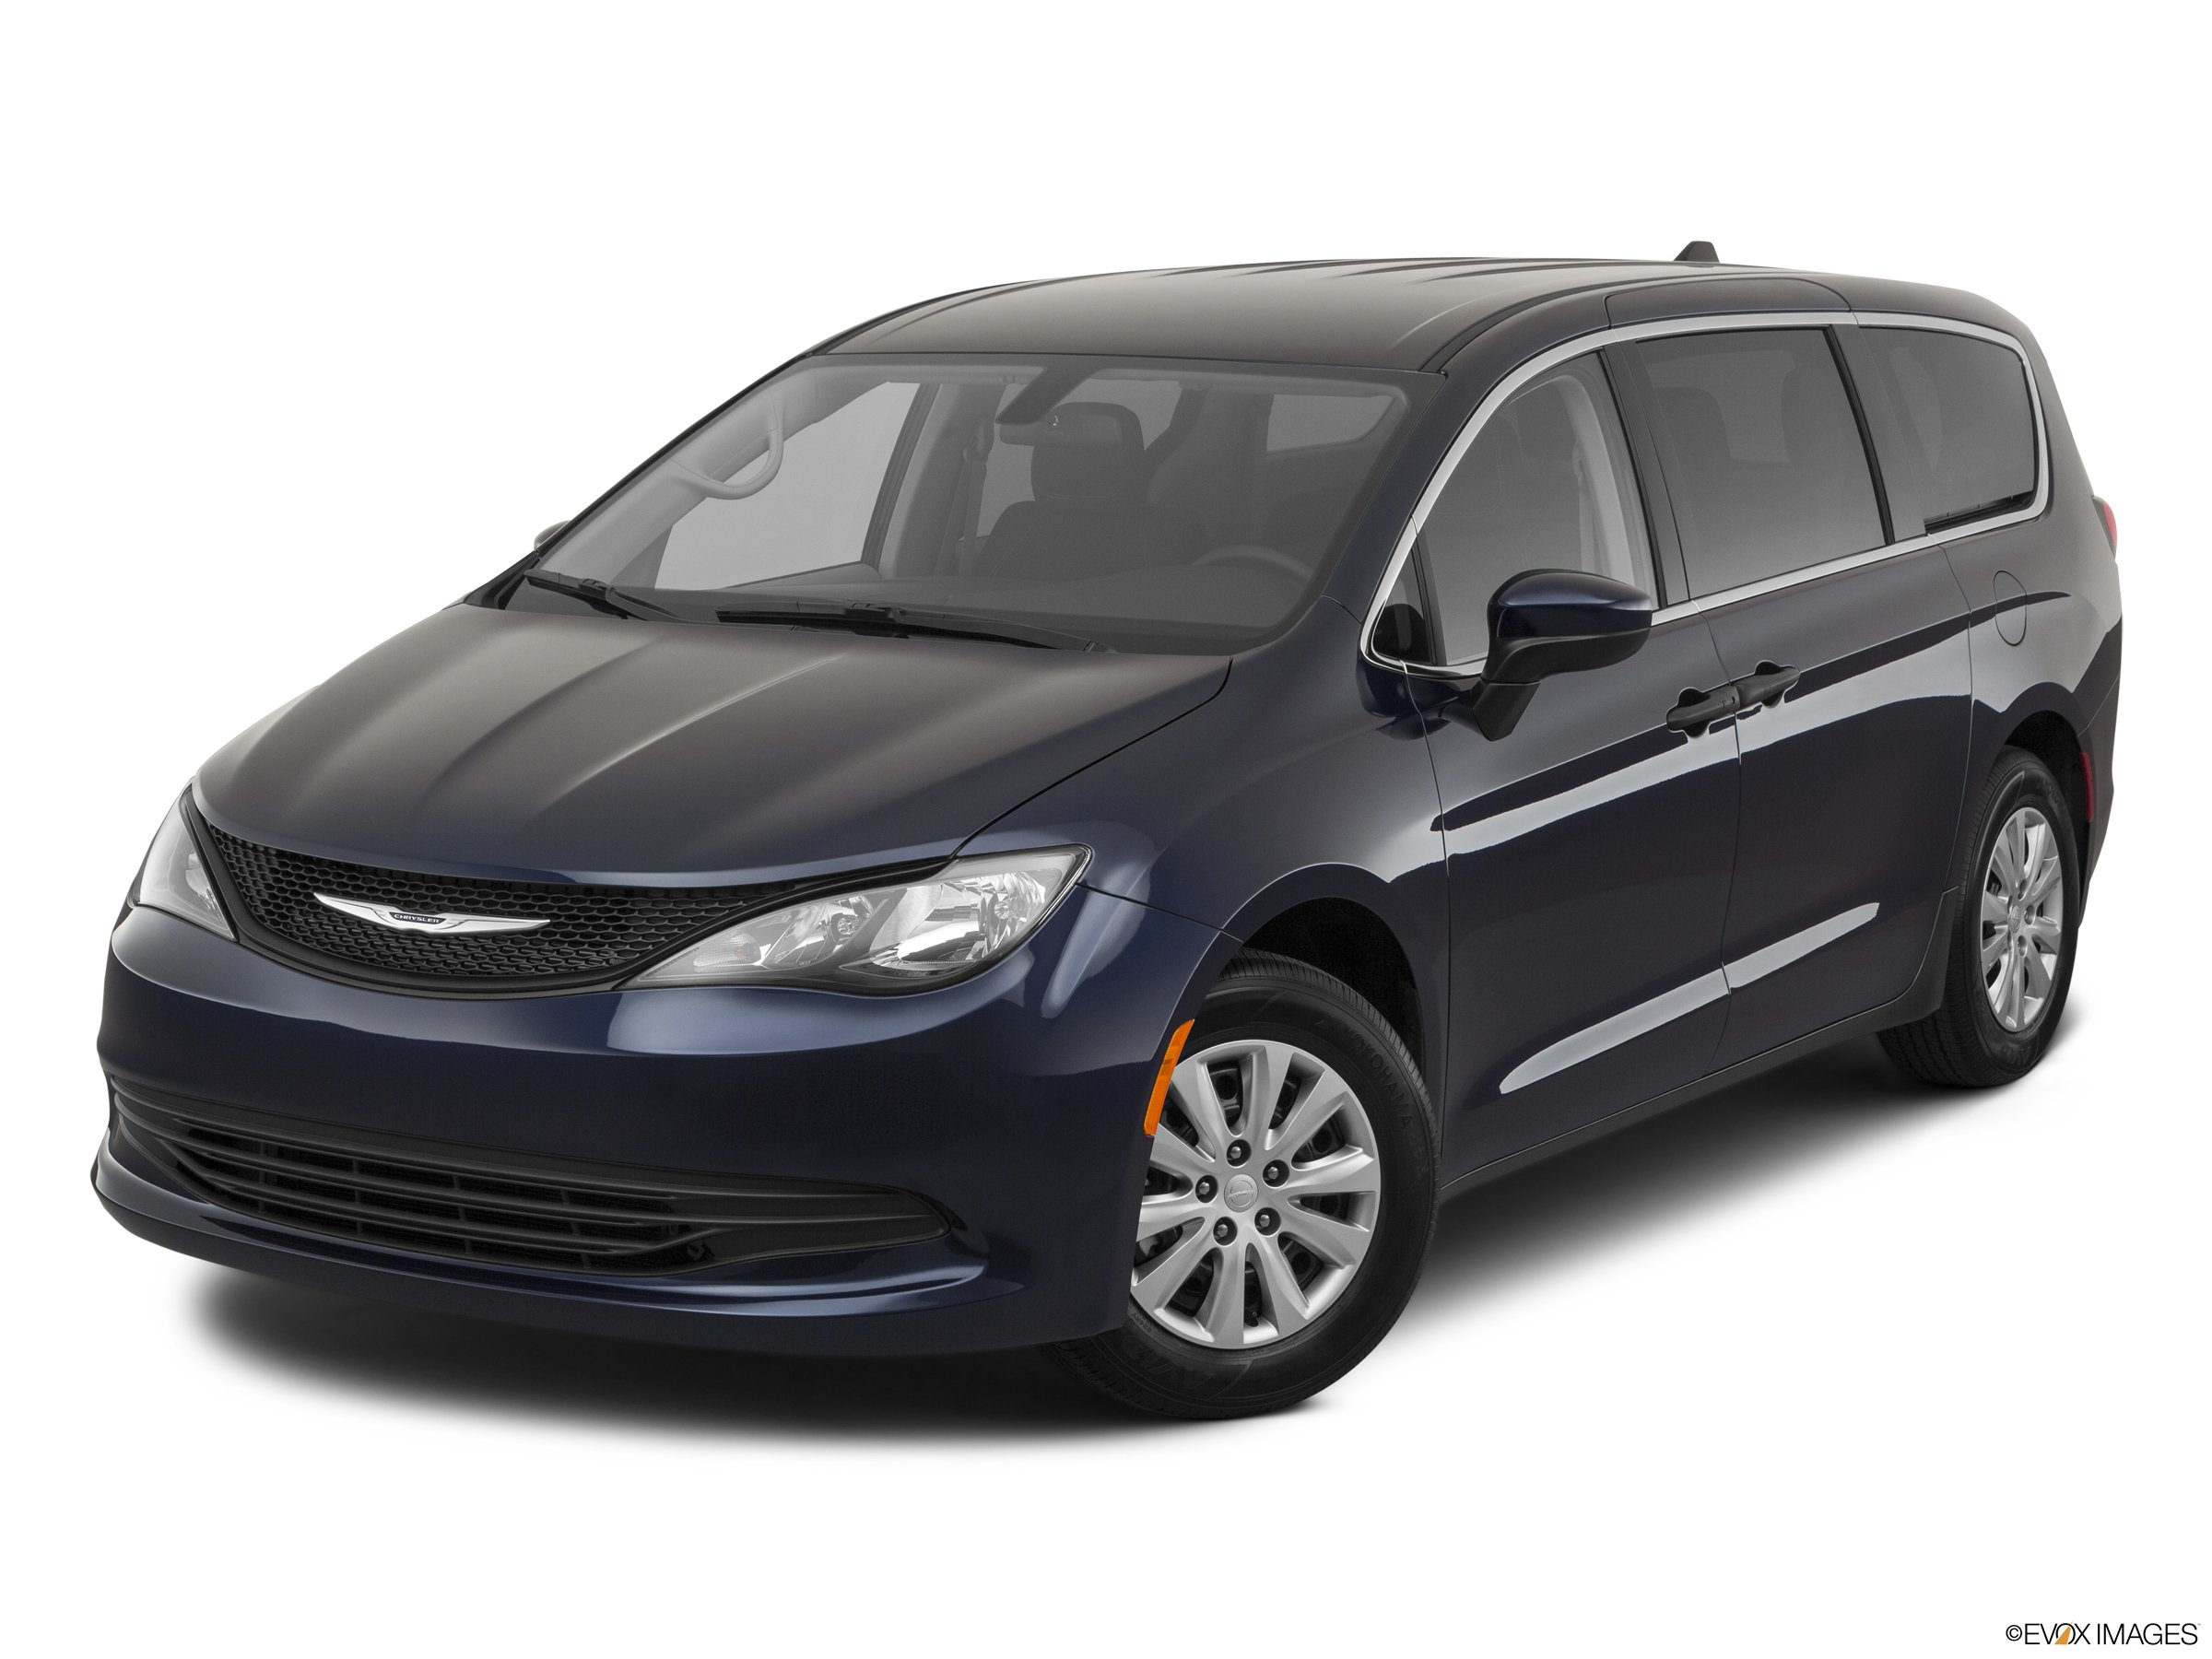 2020 Chrysler Voyager L FWD minivan